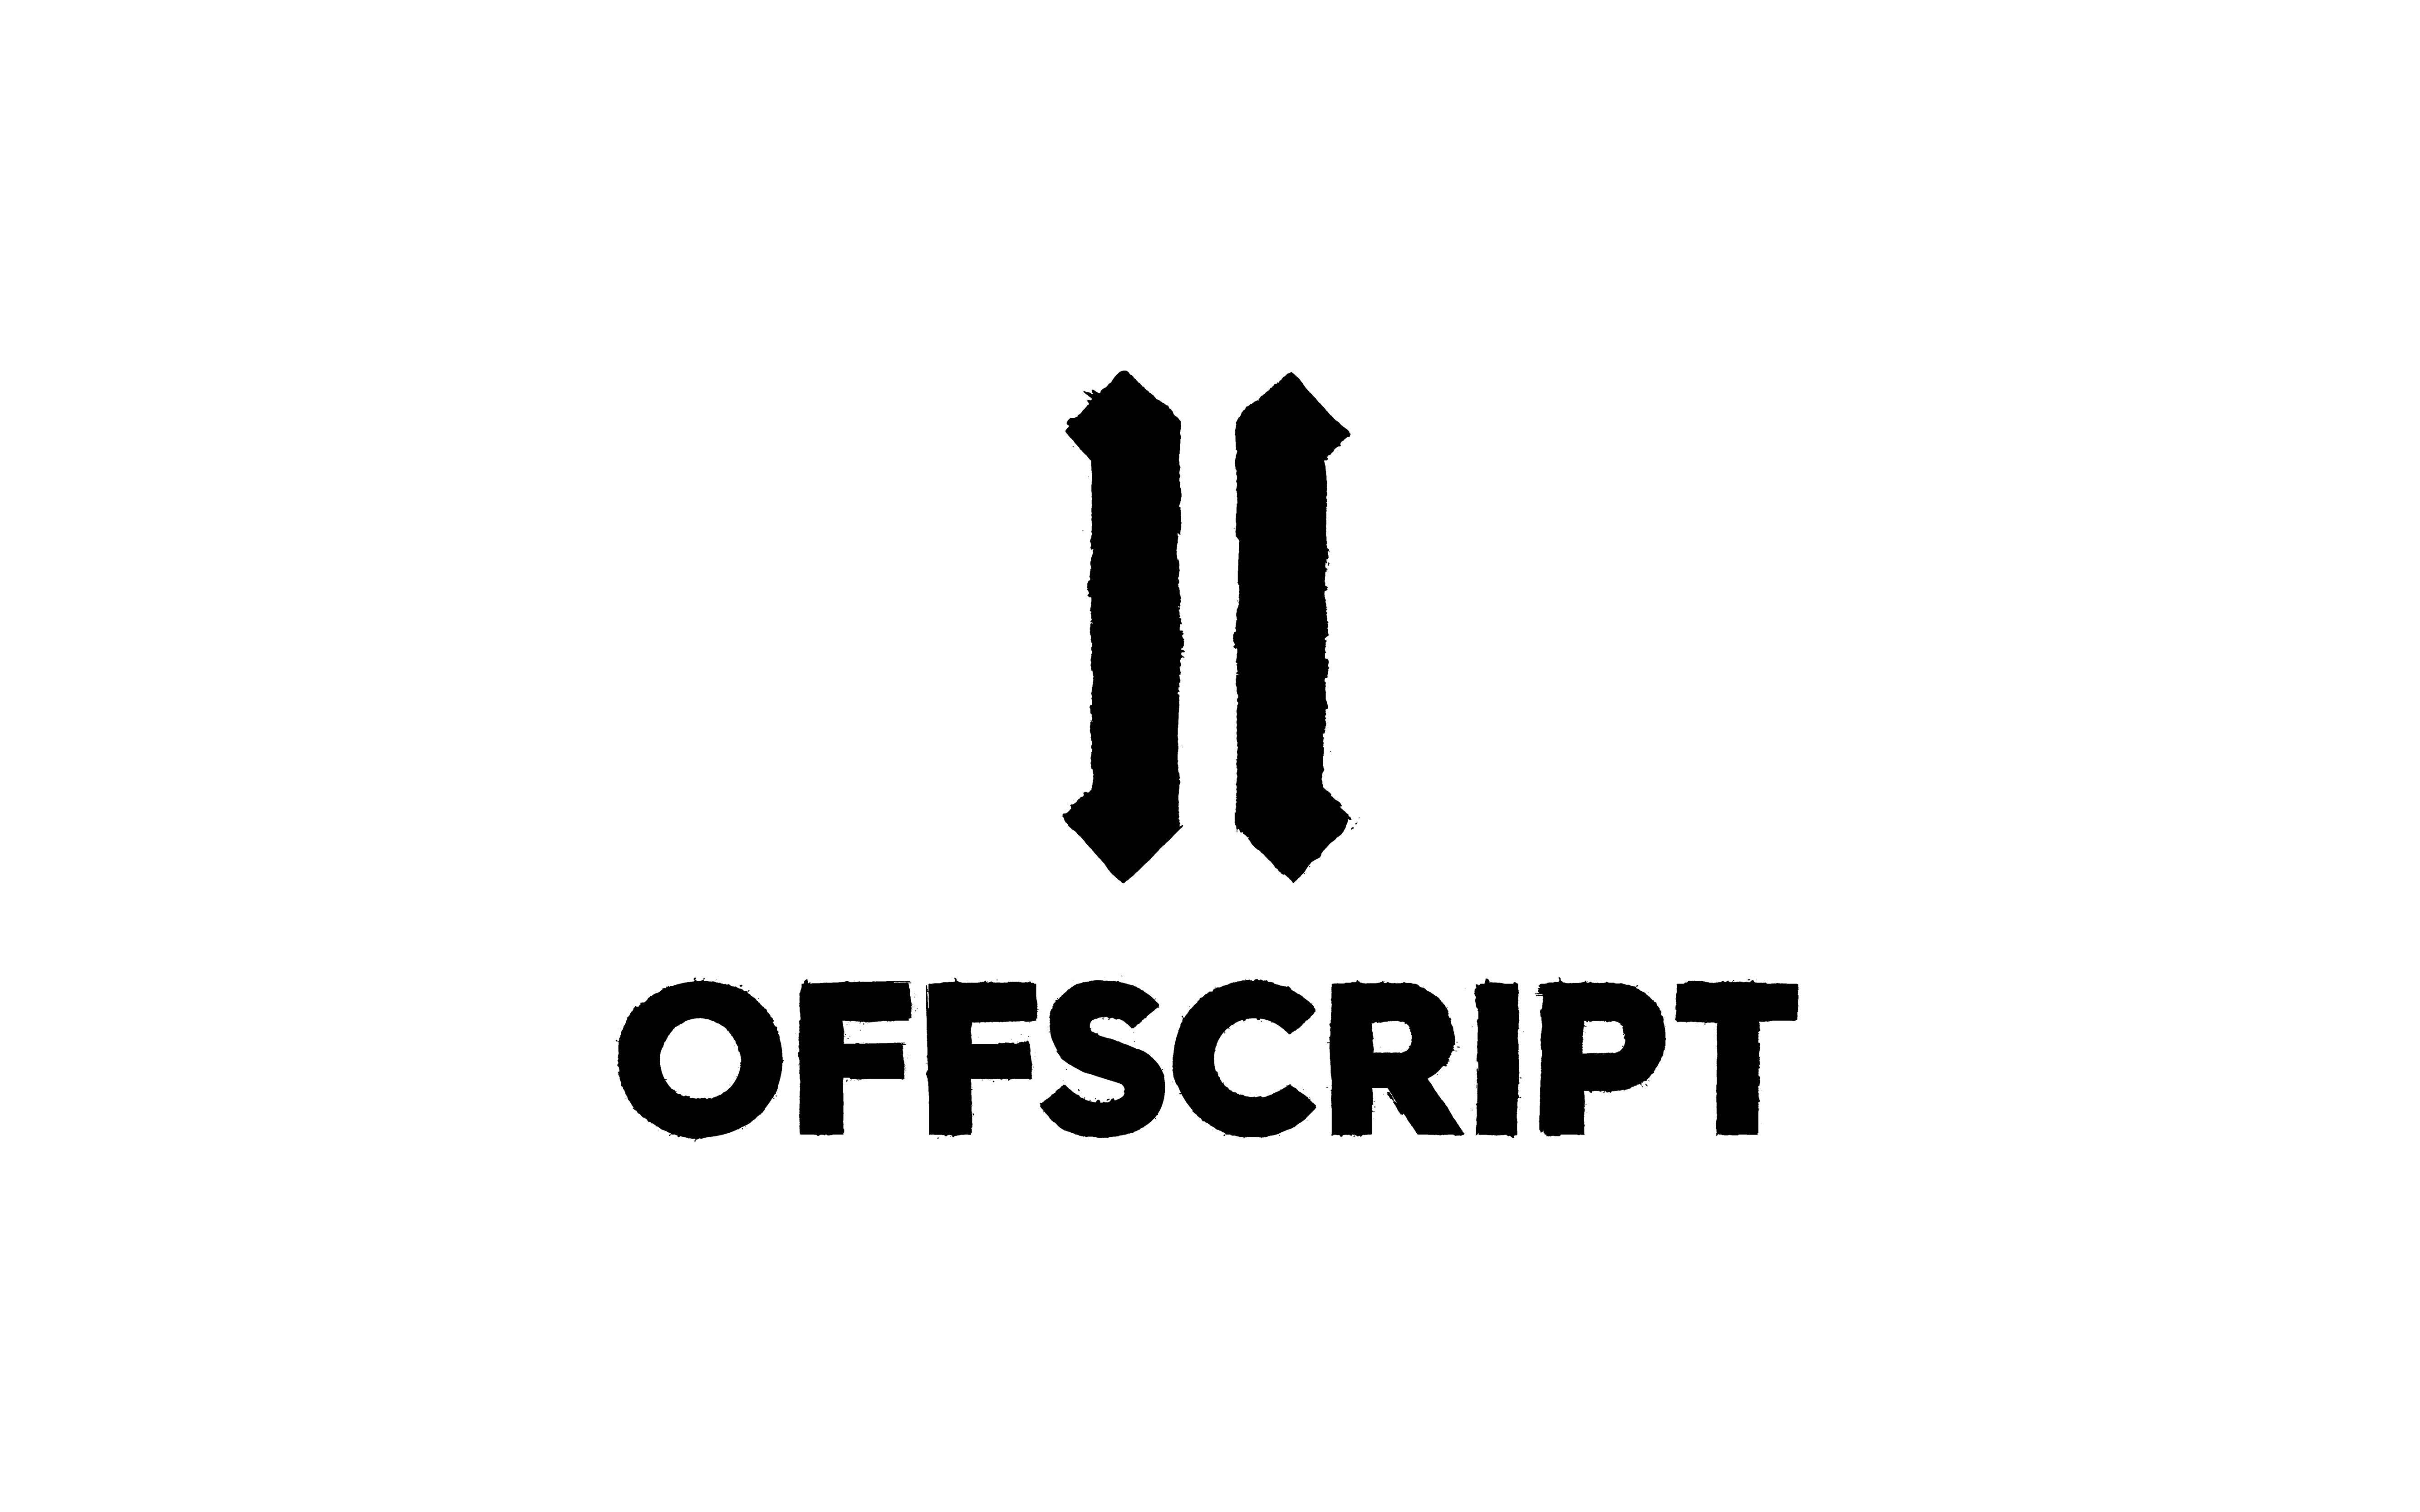 Cover image: Offscript Brand Identity